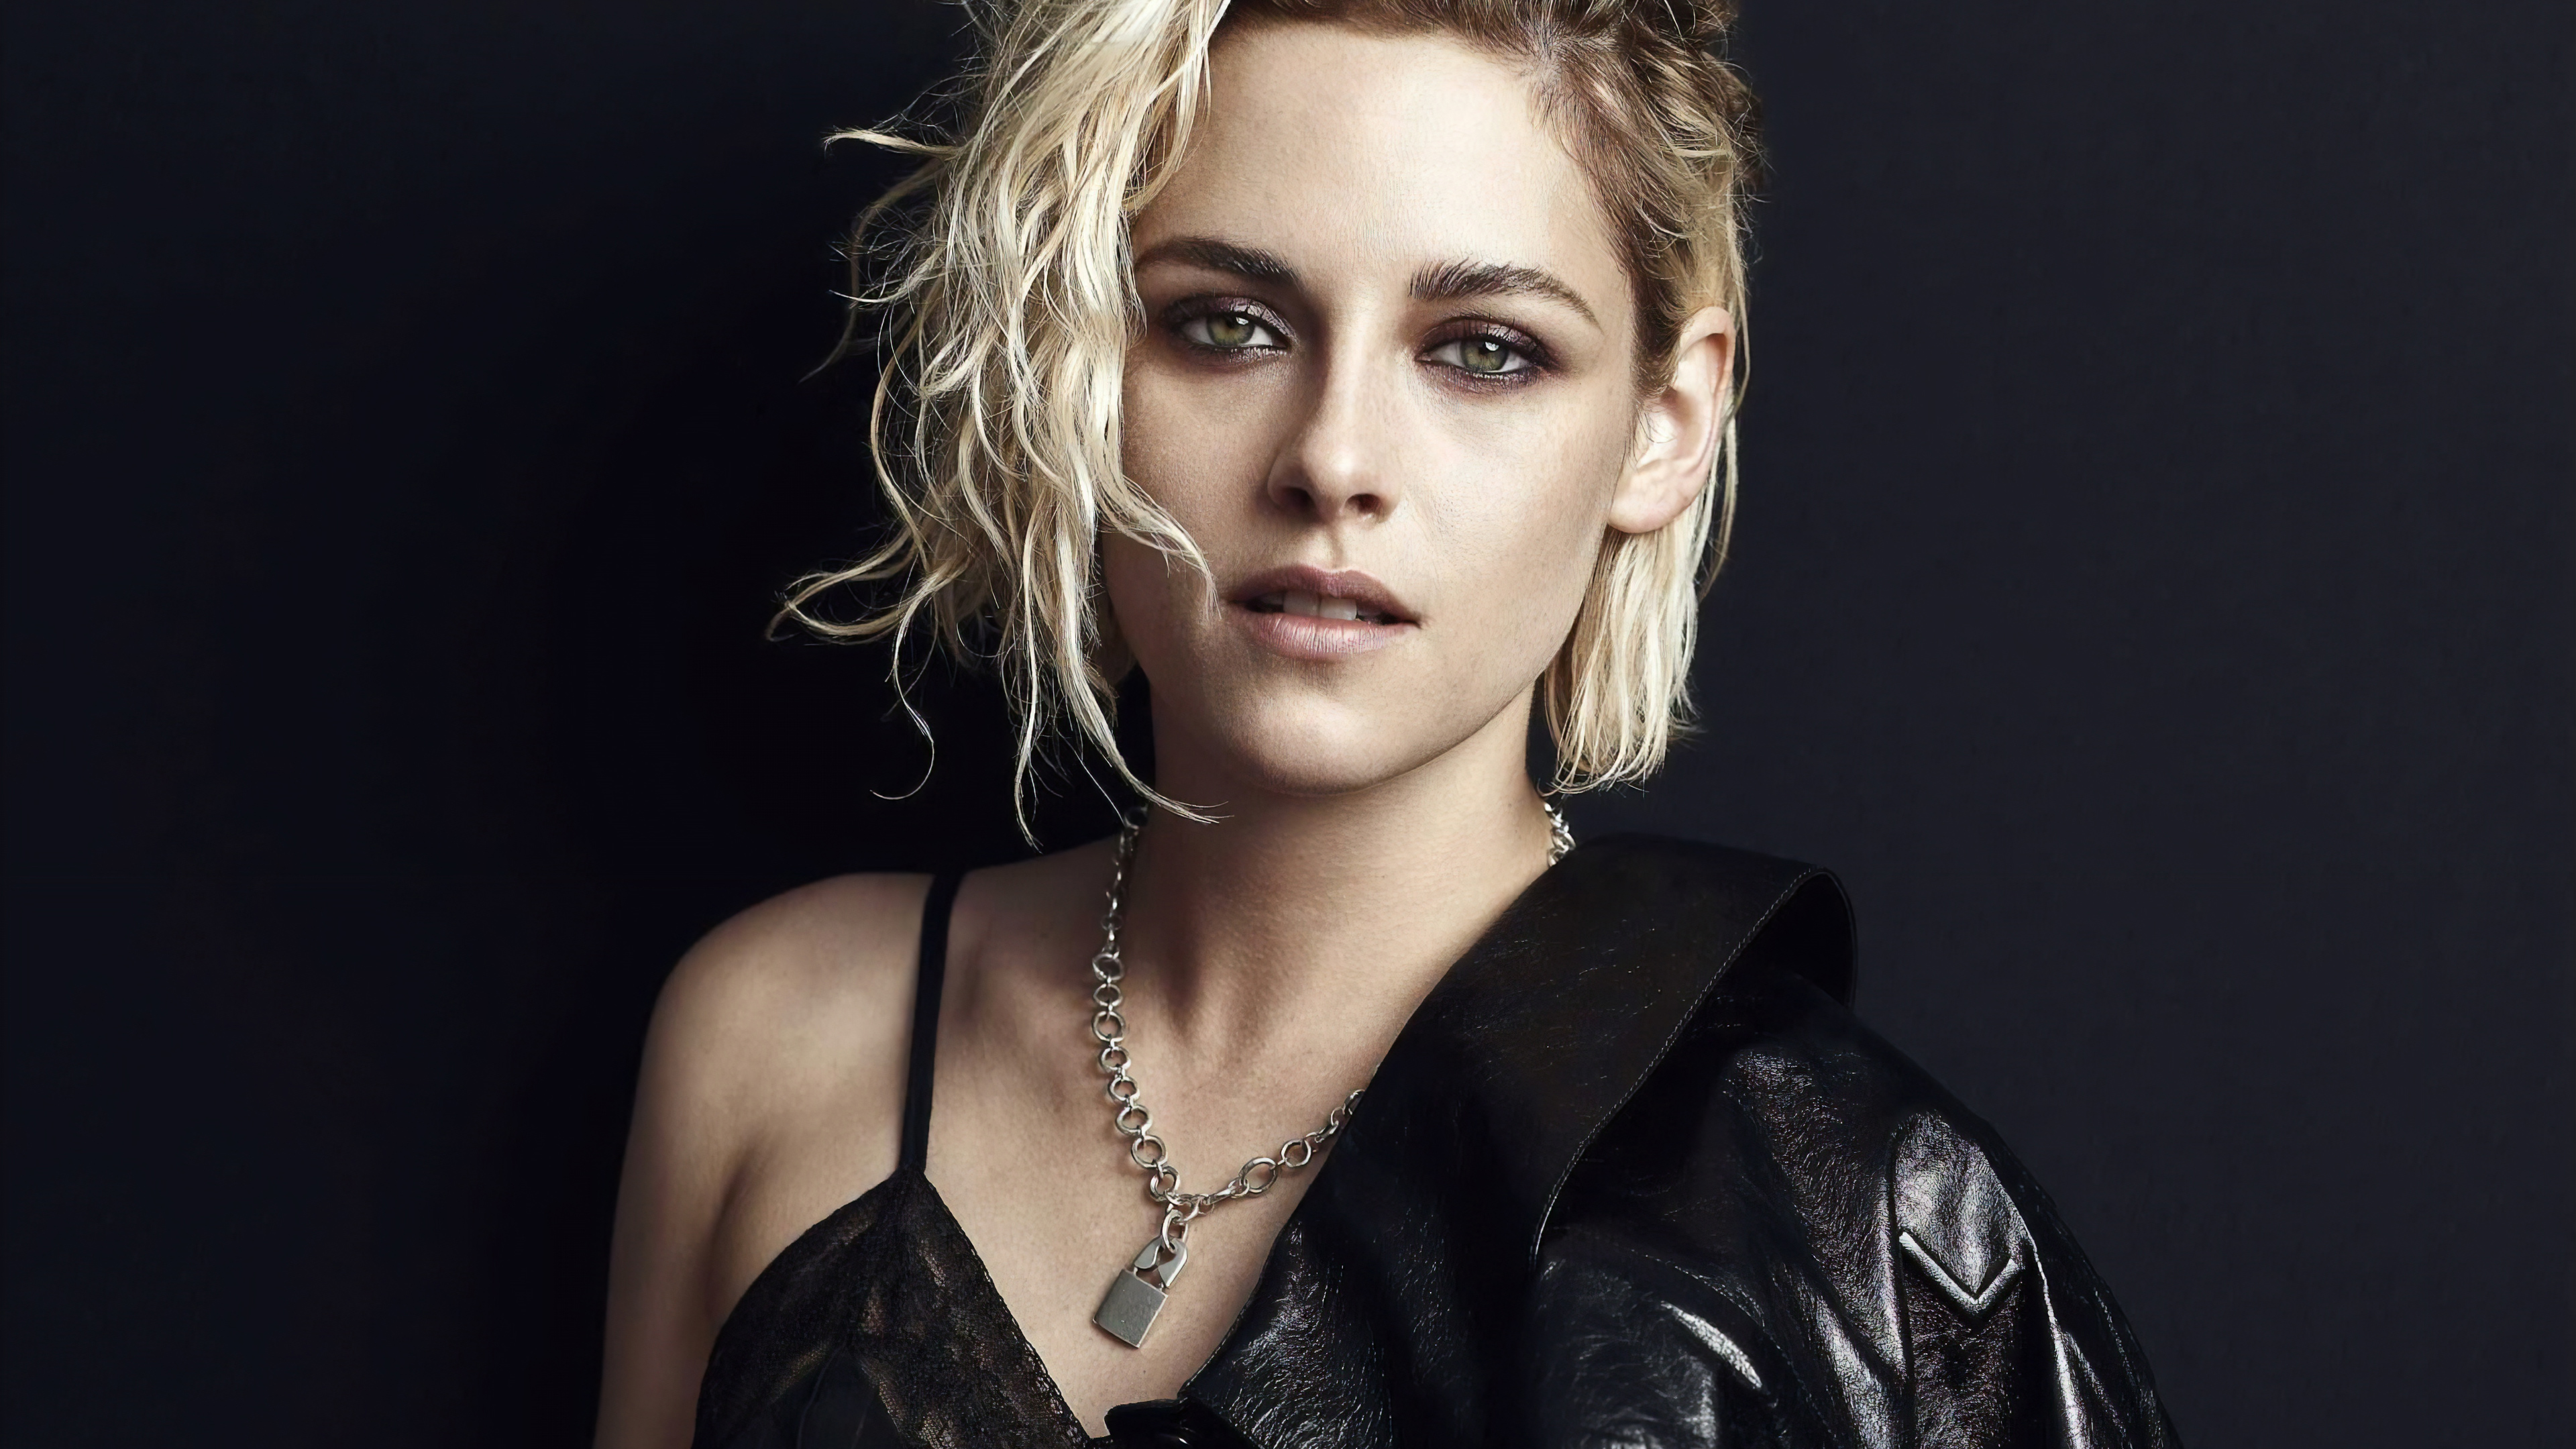 Kristen Stewart Short Blonde Hair 3840x2160 Wallpaper Teahub Io